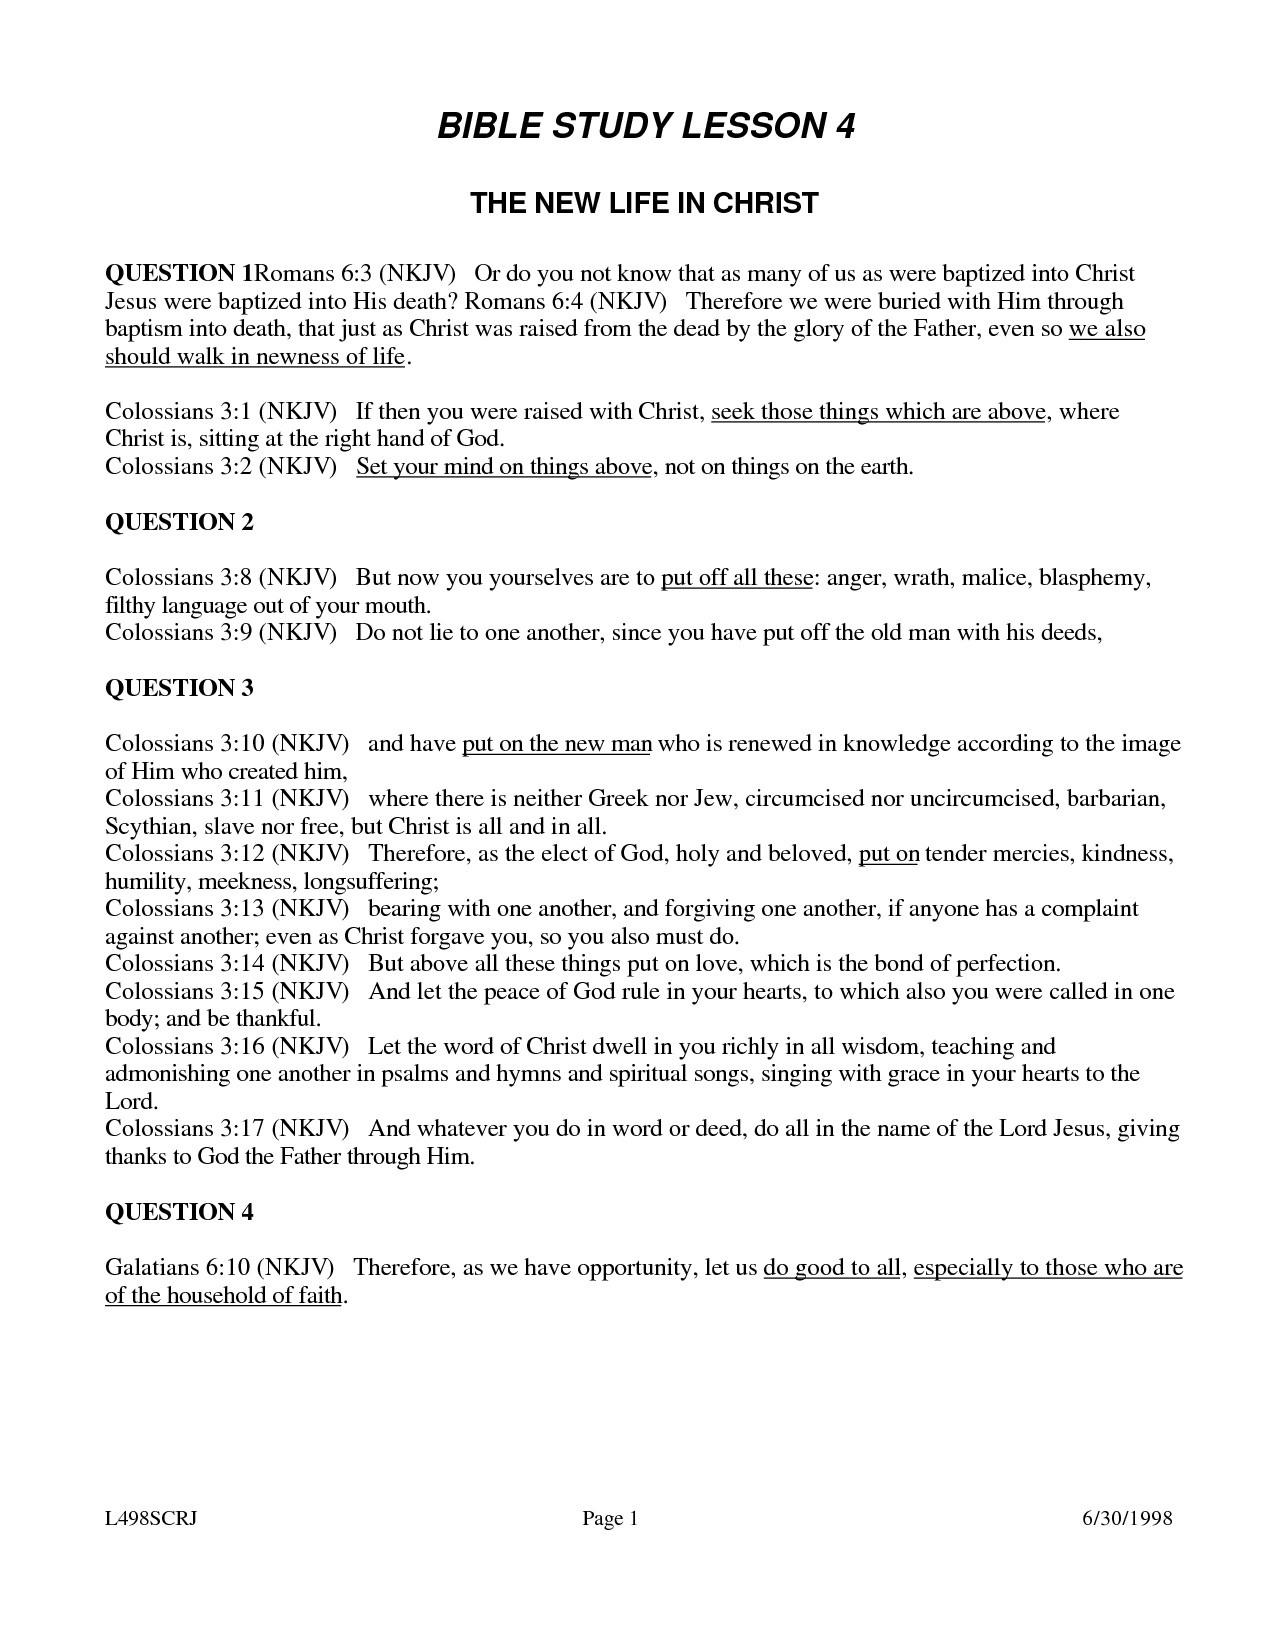 Printable Womens Bible Study Lessons Free (82+ Images In Collection - Free Printable Bible Lessons For Women